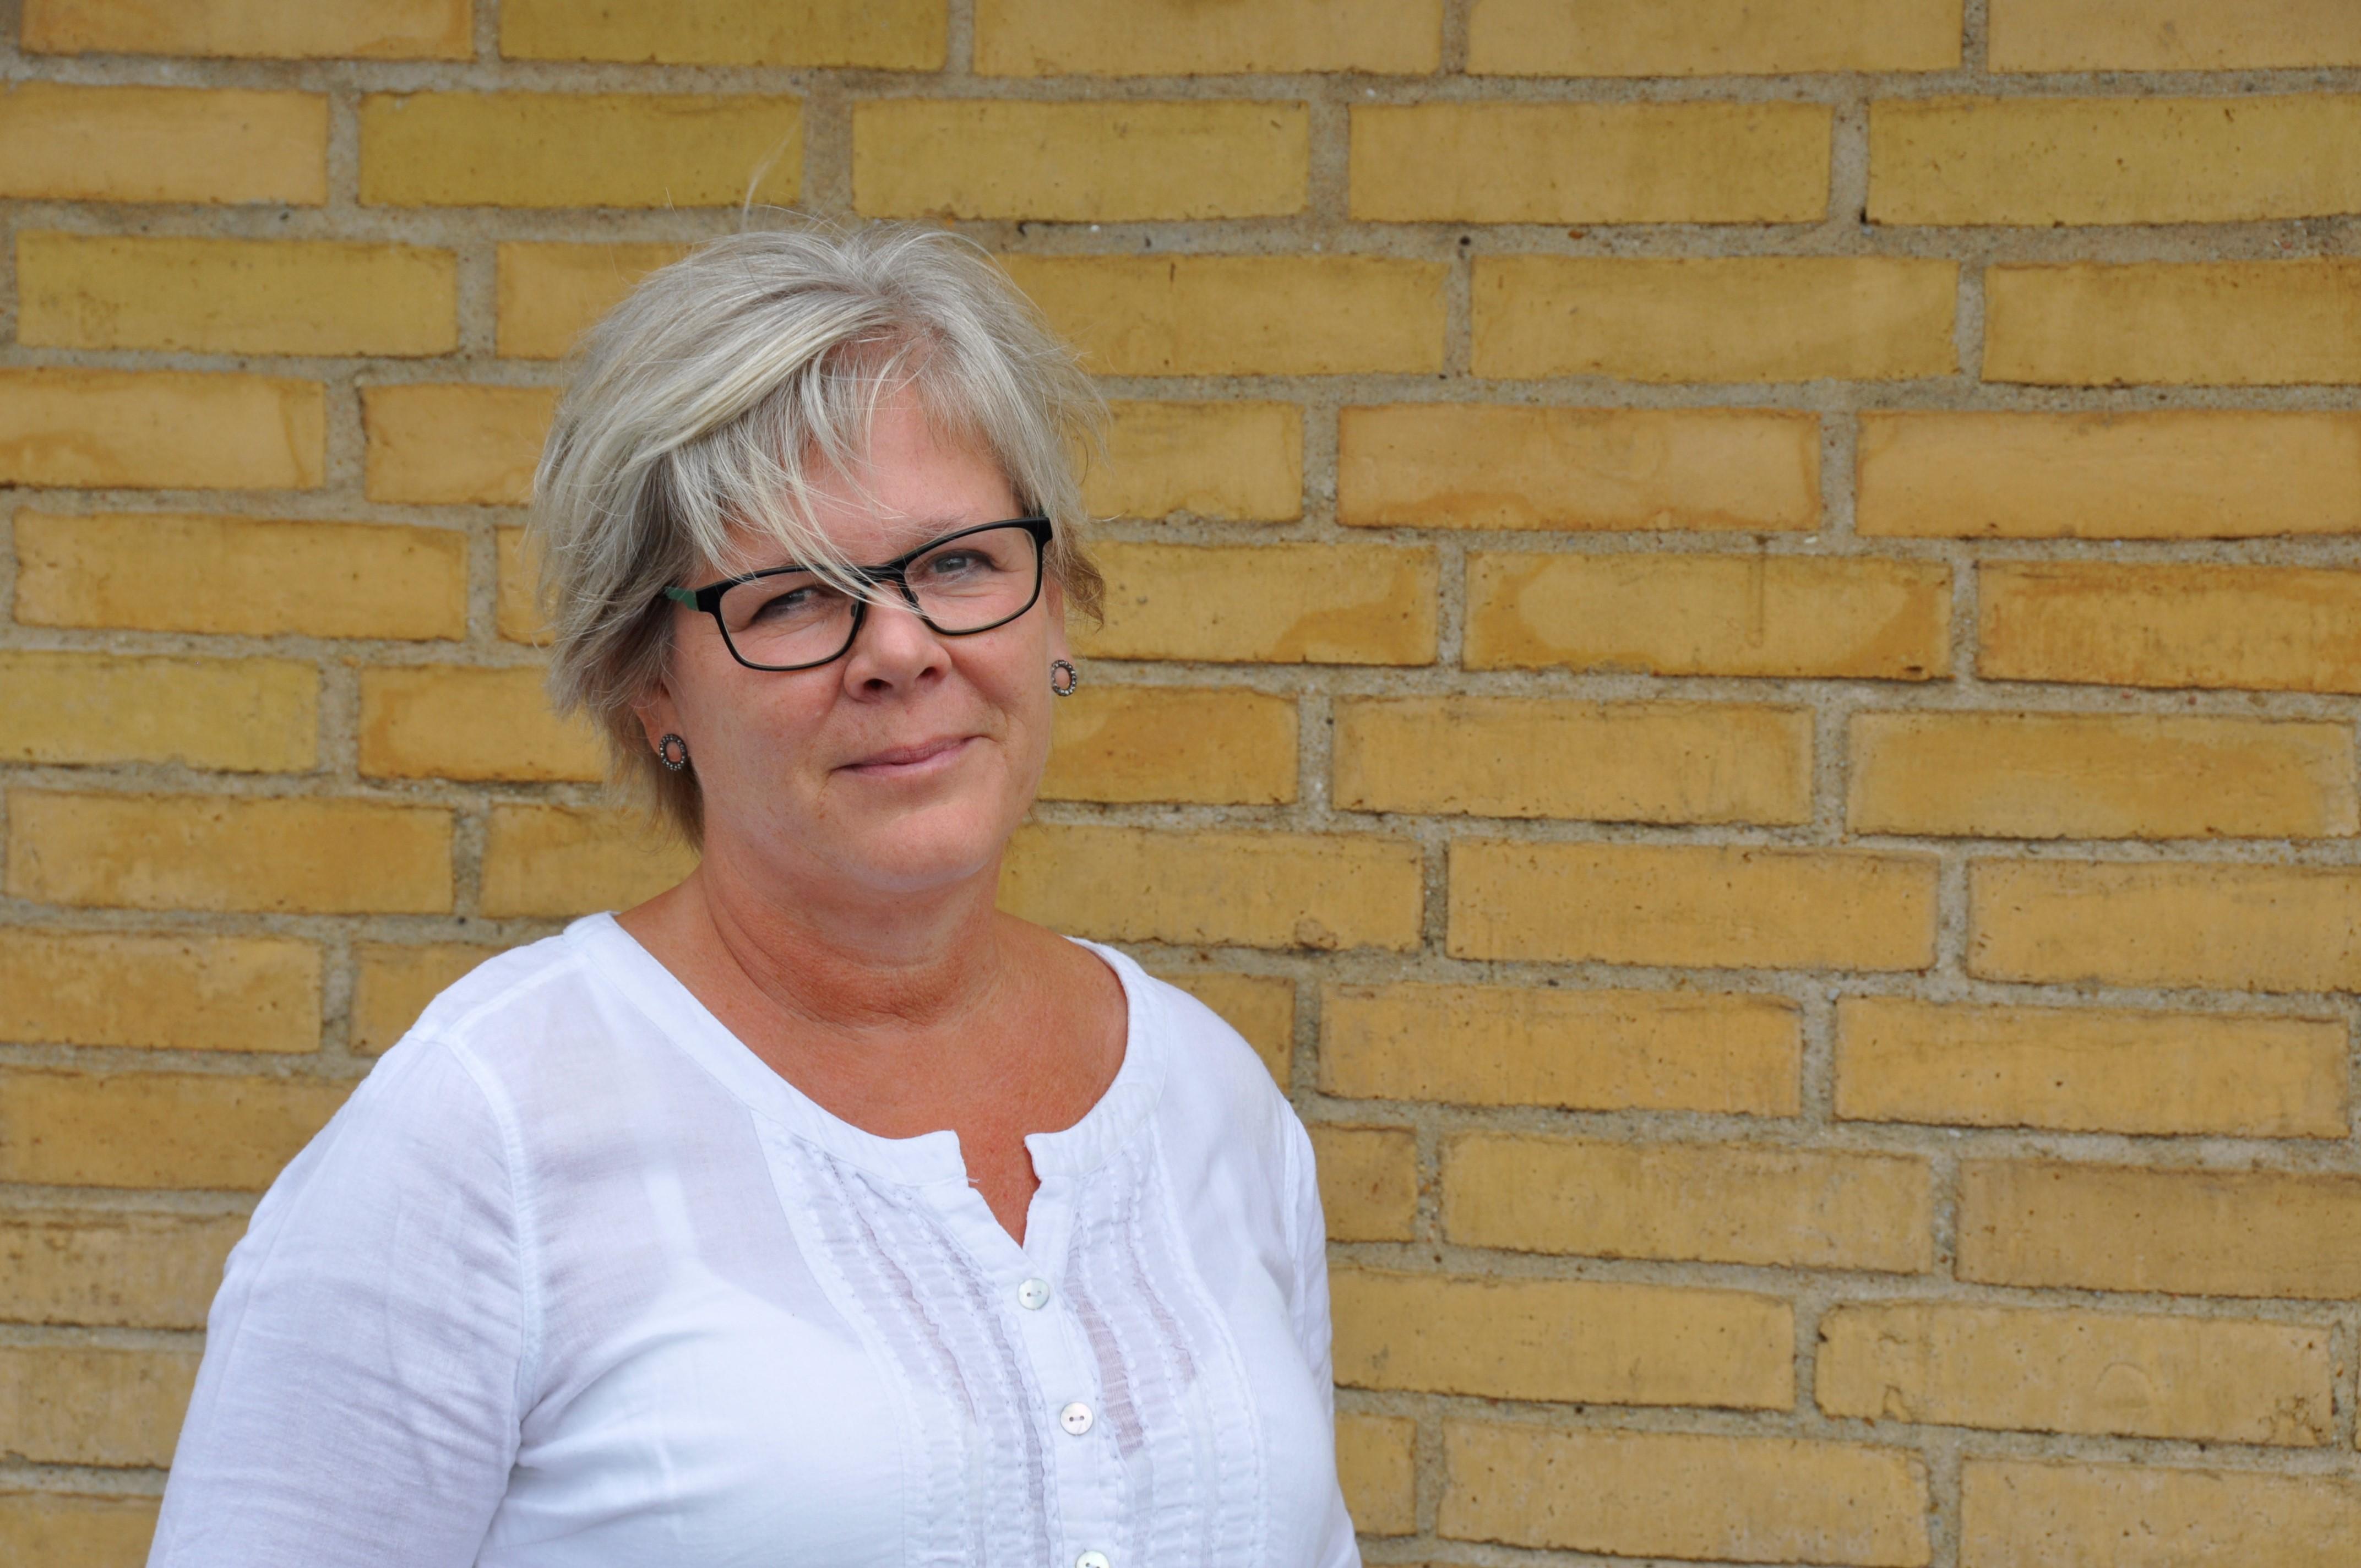 Marianne Nordholm